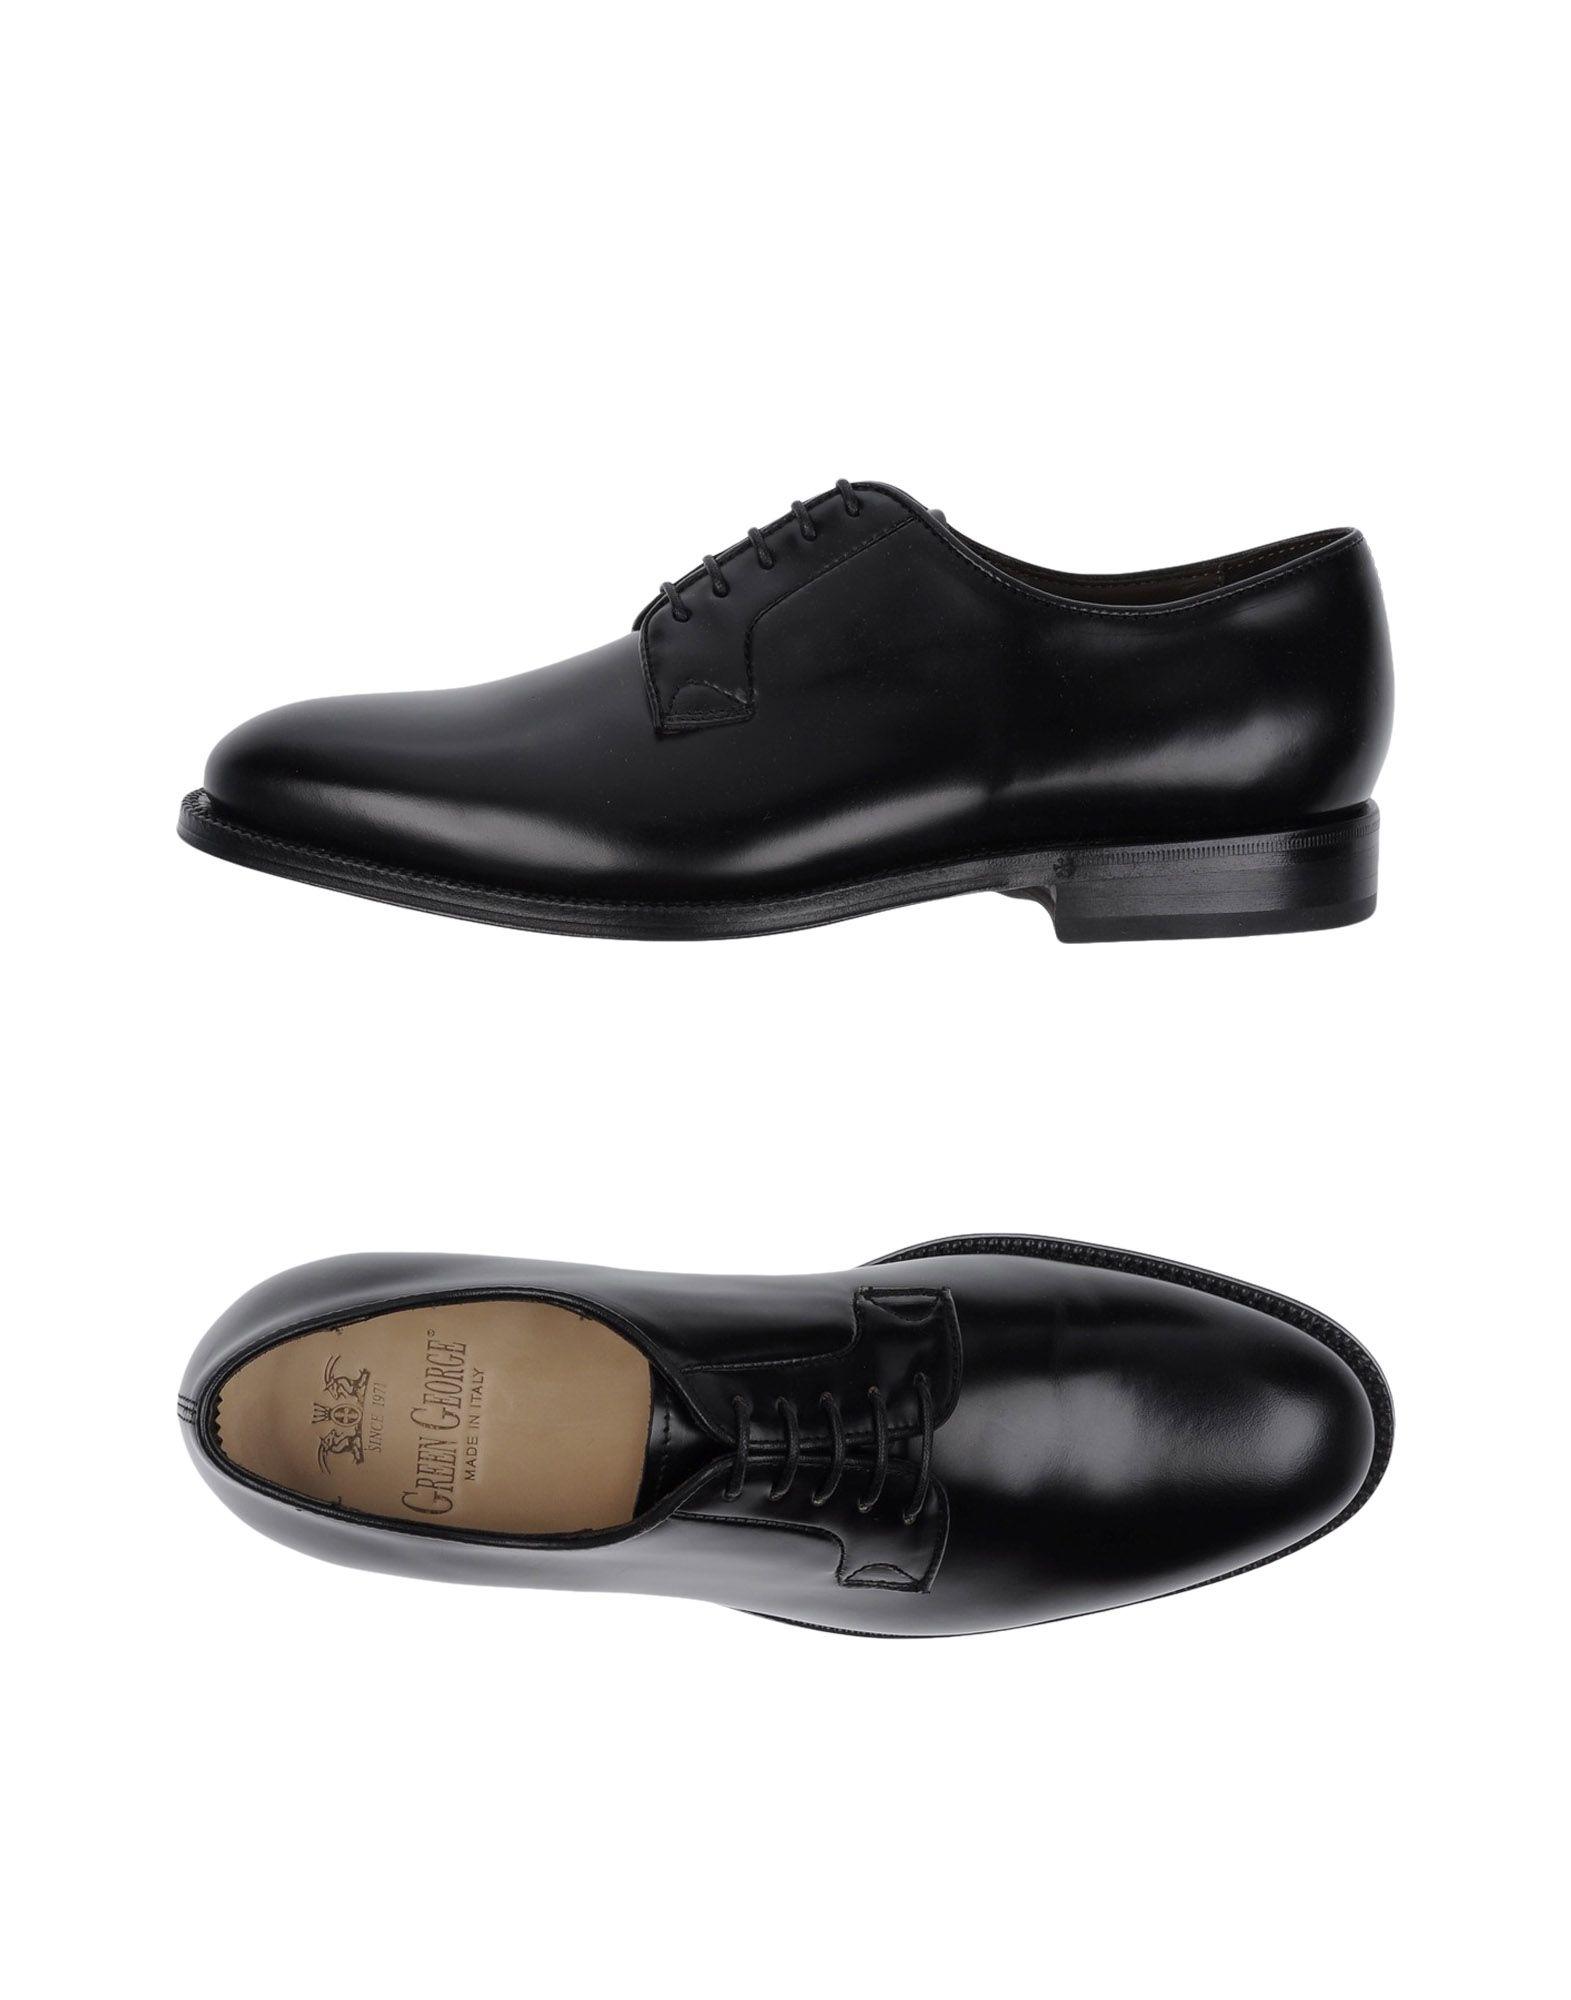 Green George Schnürschuhe Herren  Schuhe 11242368EA Gute Qualität beliebte Schuhe  7522ea